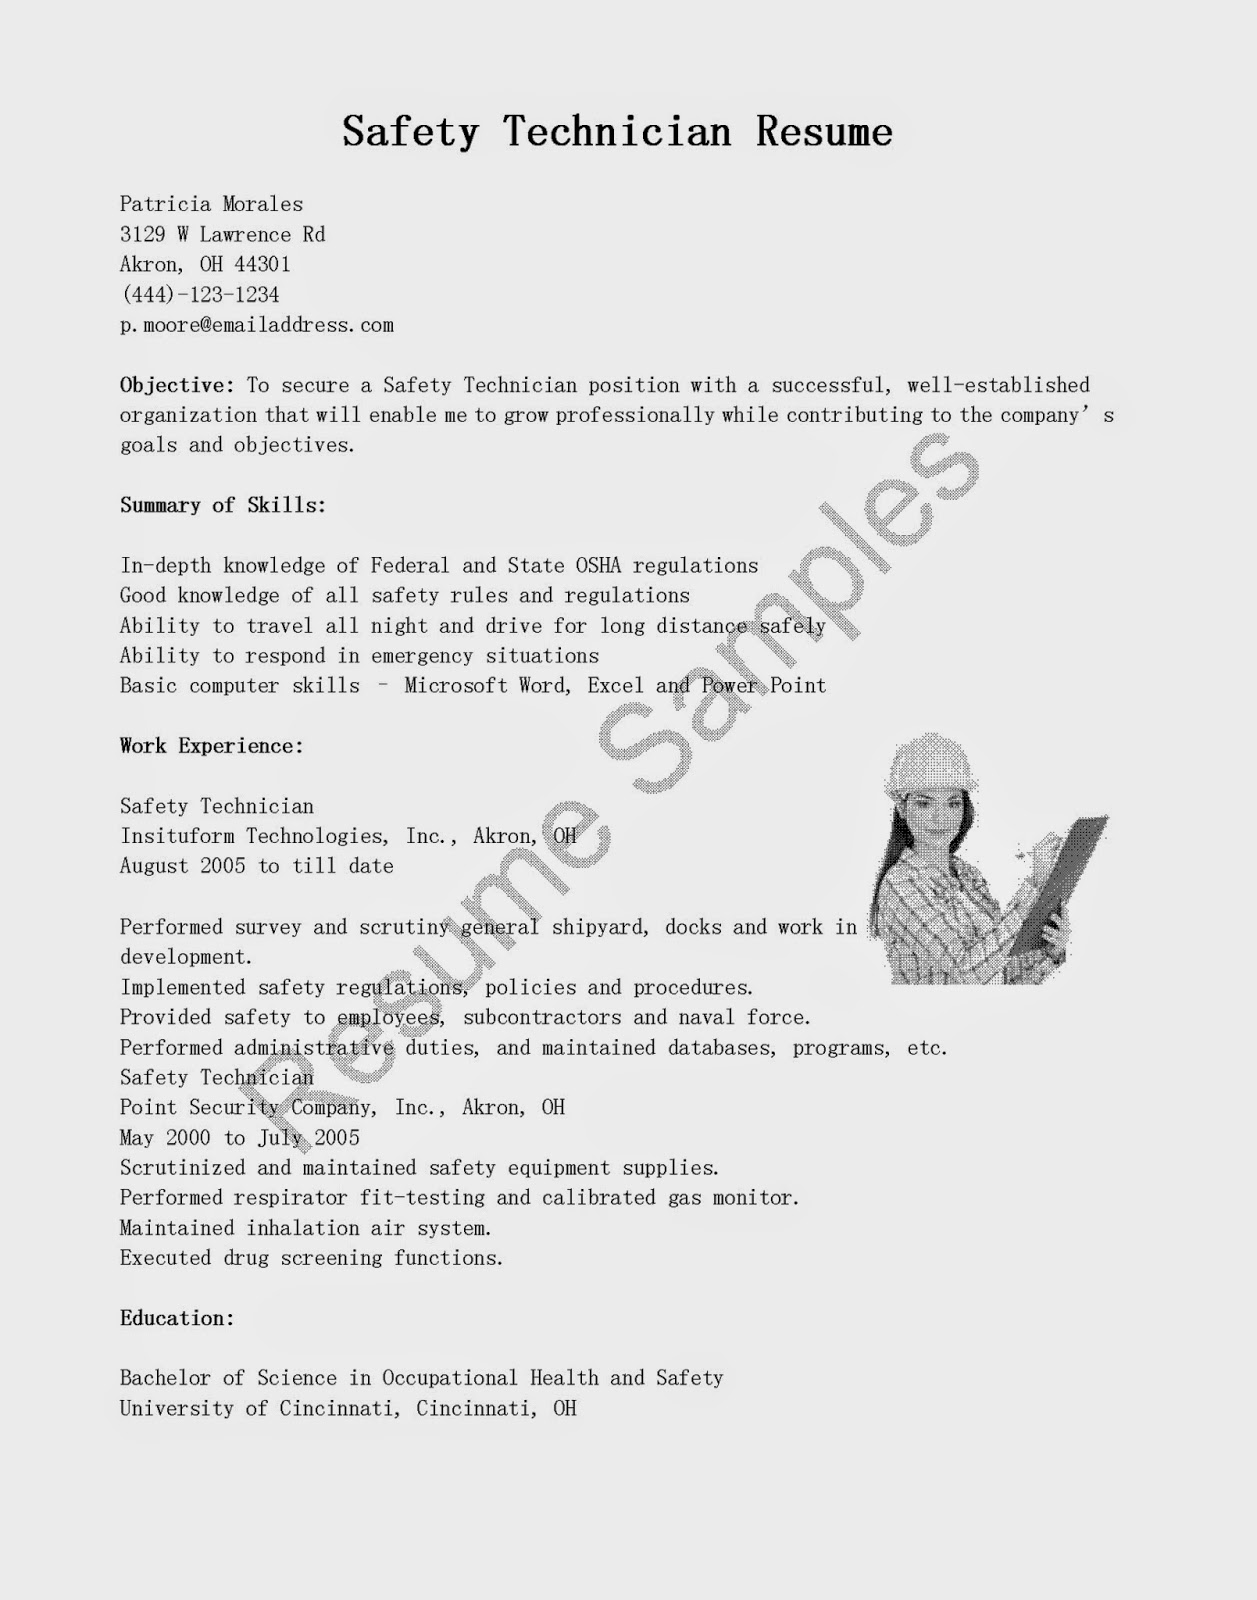 resume samples  safety technician resume sample